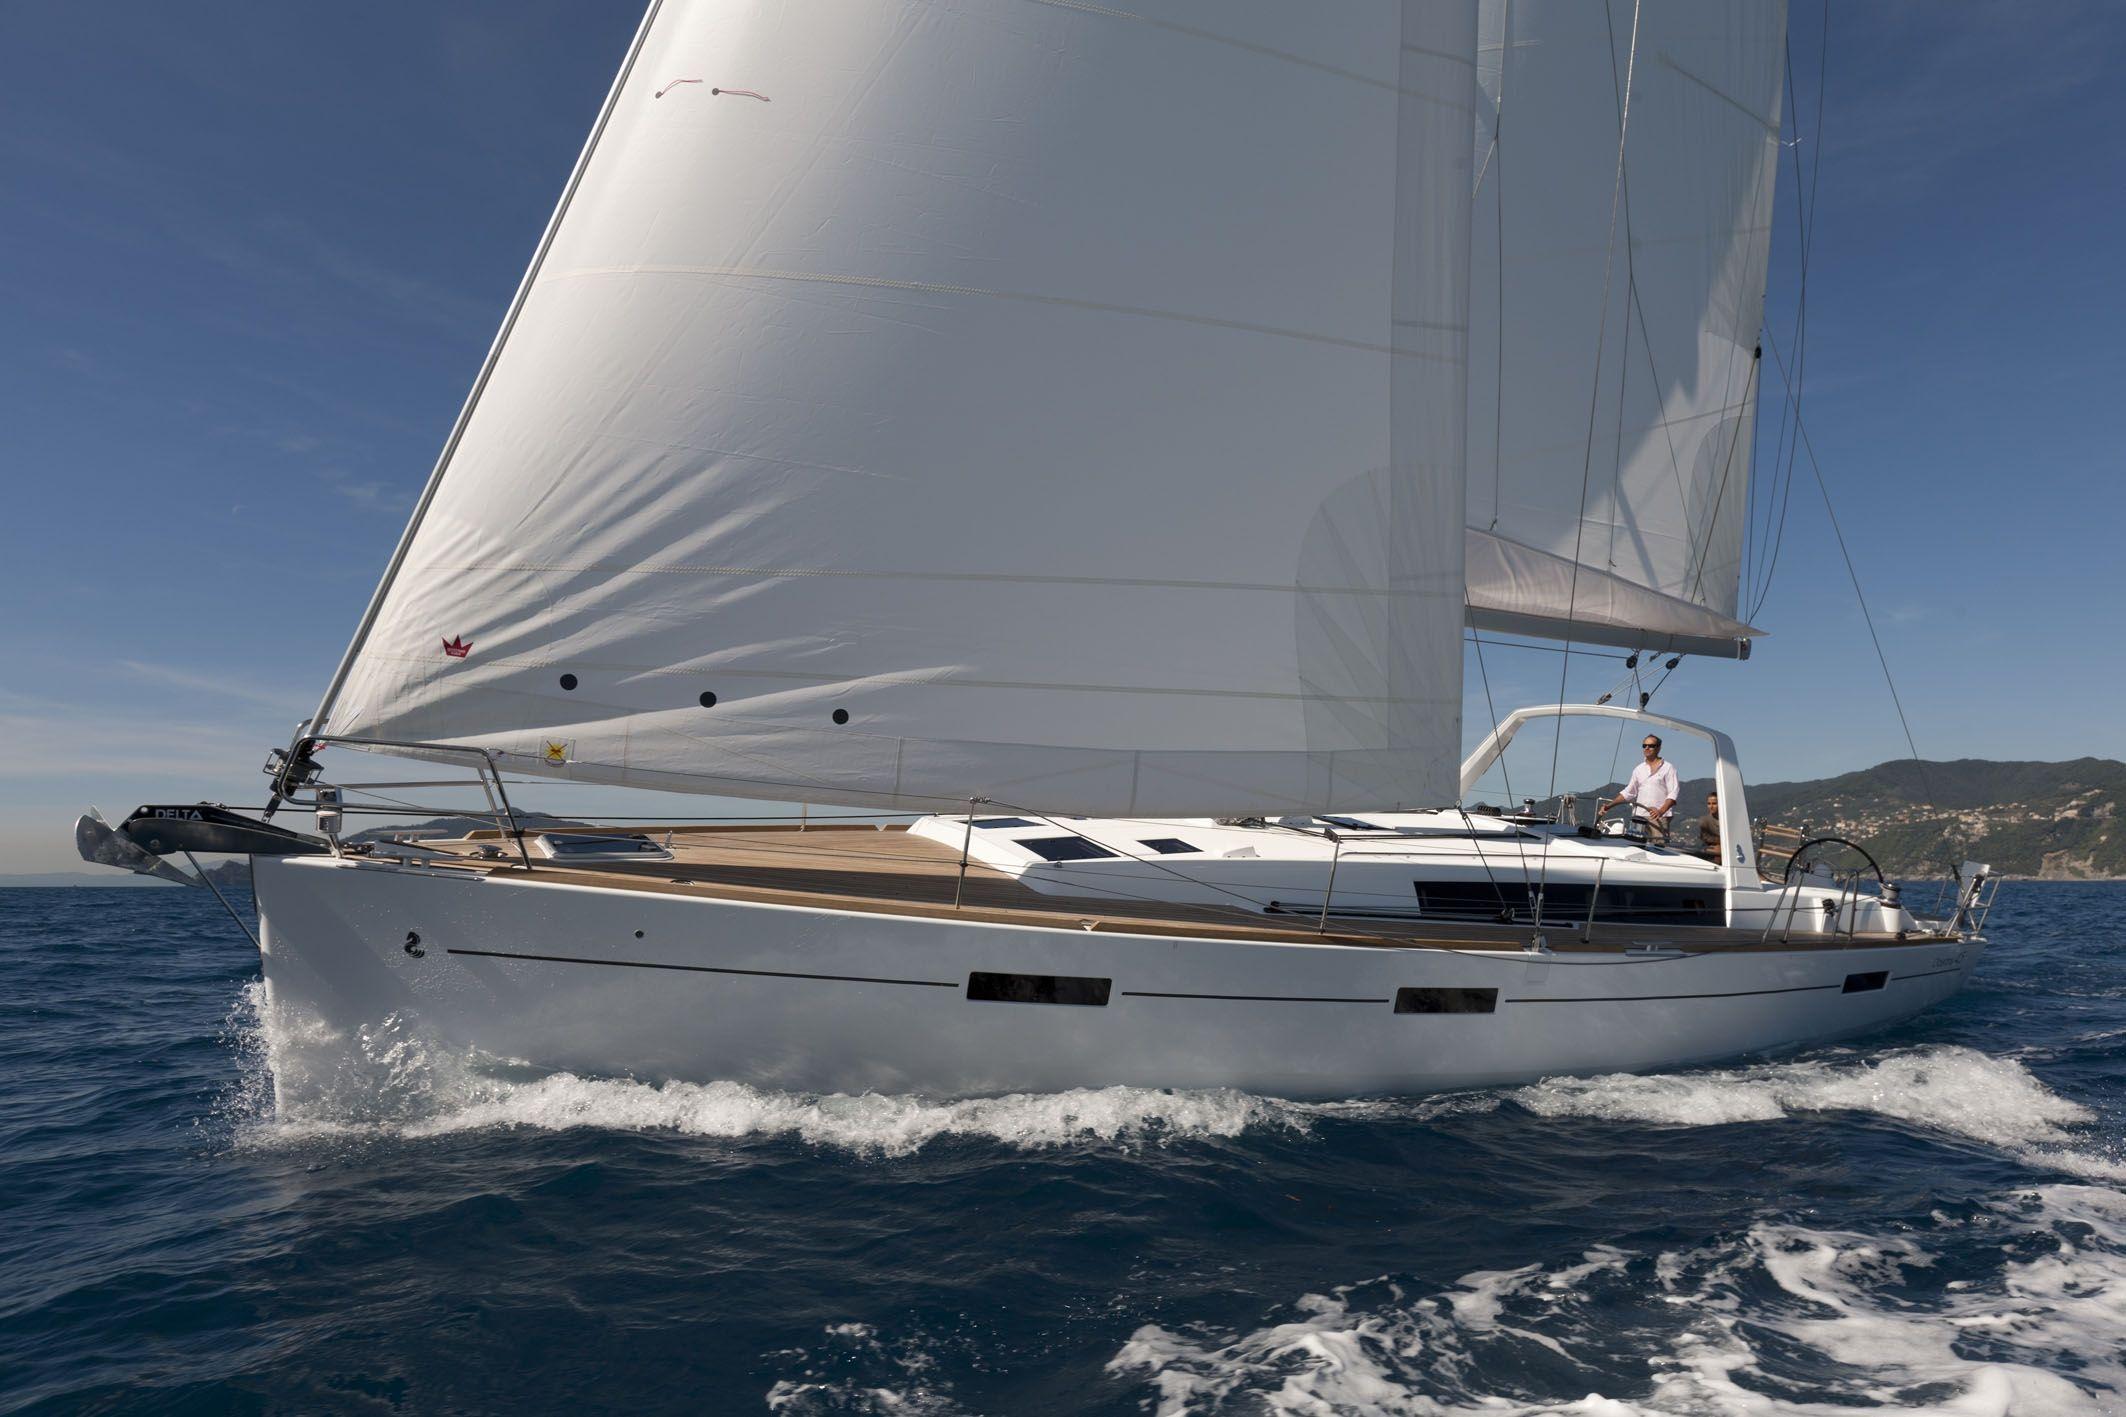 Oceanis 45 - 4 Cabins - Tortola - British Virgin Islands